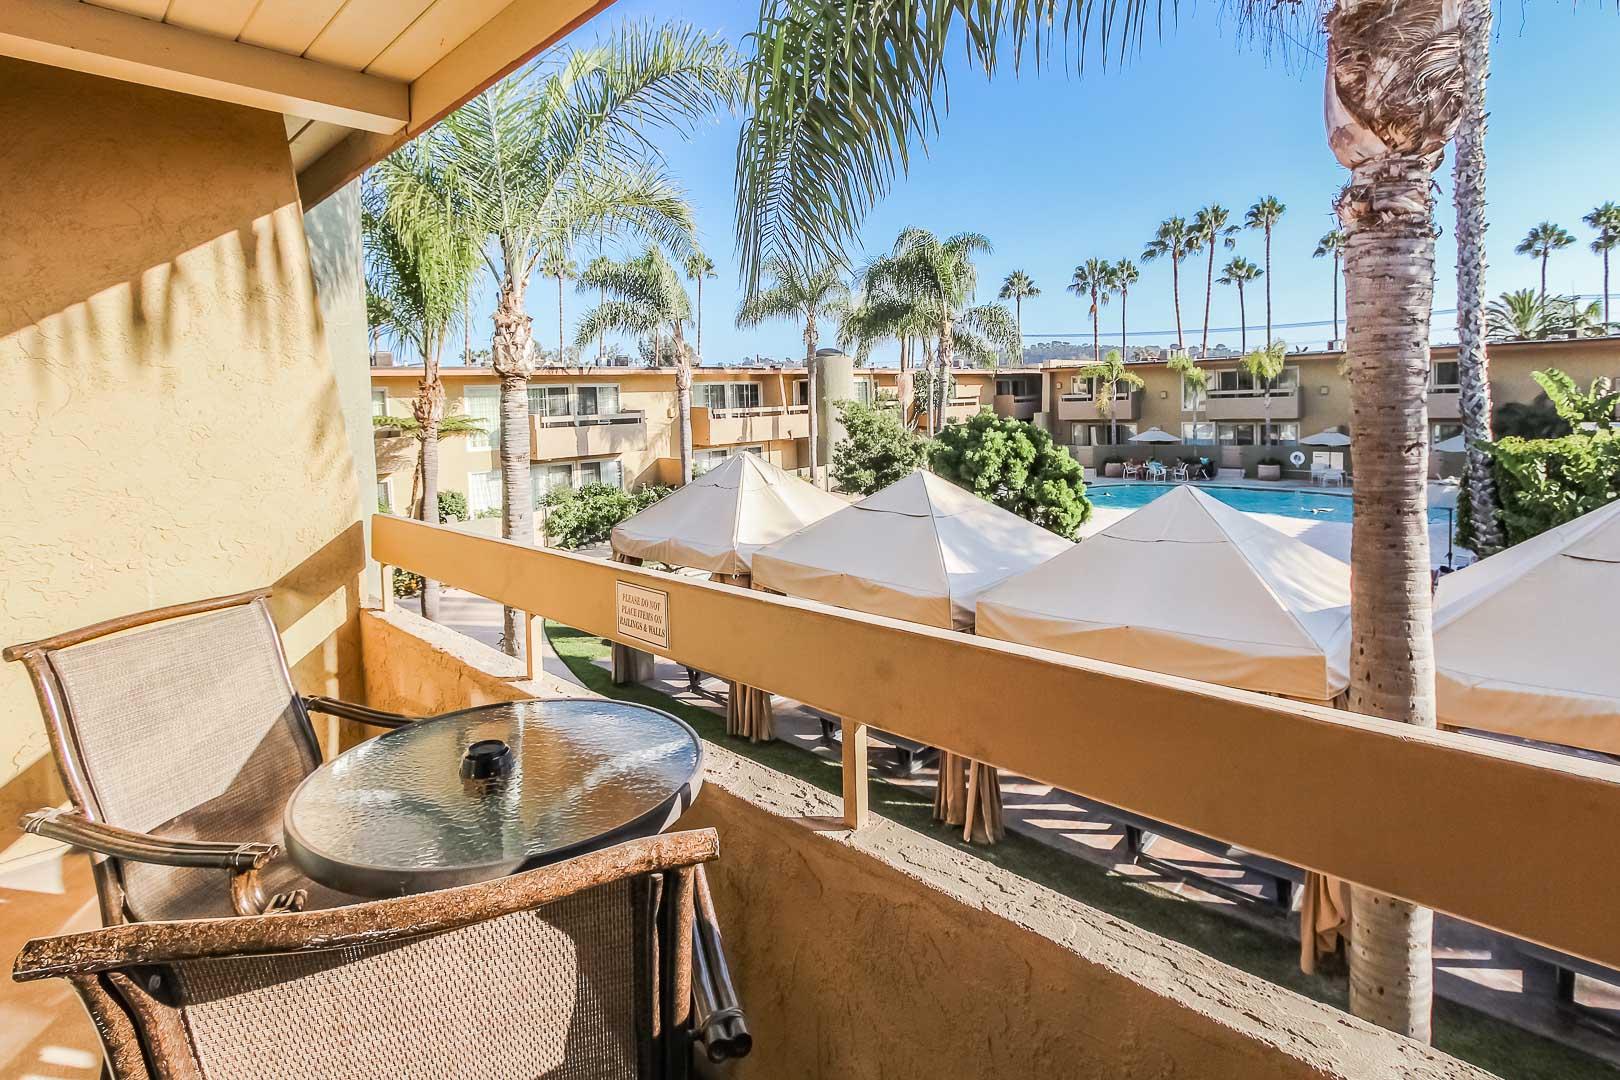 A relaxing balcony view at VRI's Winner Circle Resort in California.